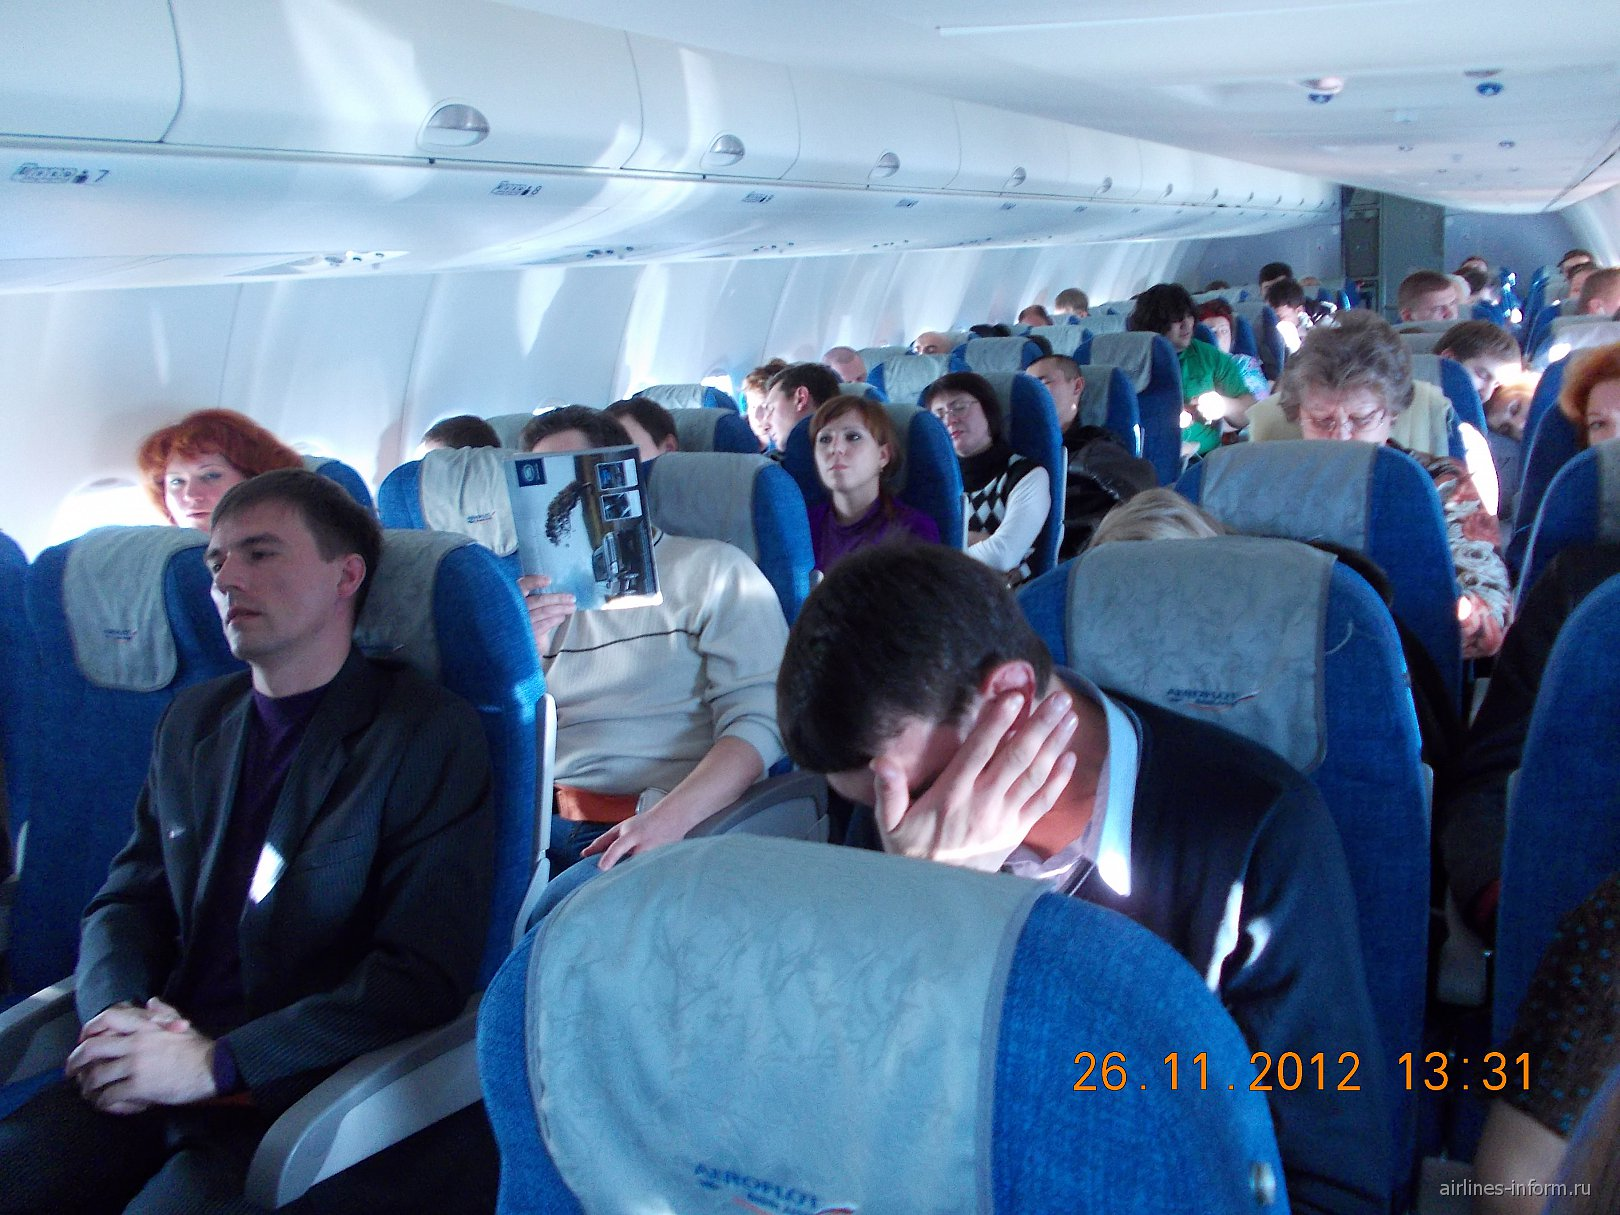 Салон самолета Суперджет-100 авиакомпании Аэрофлот